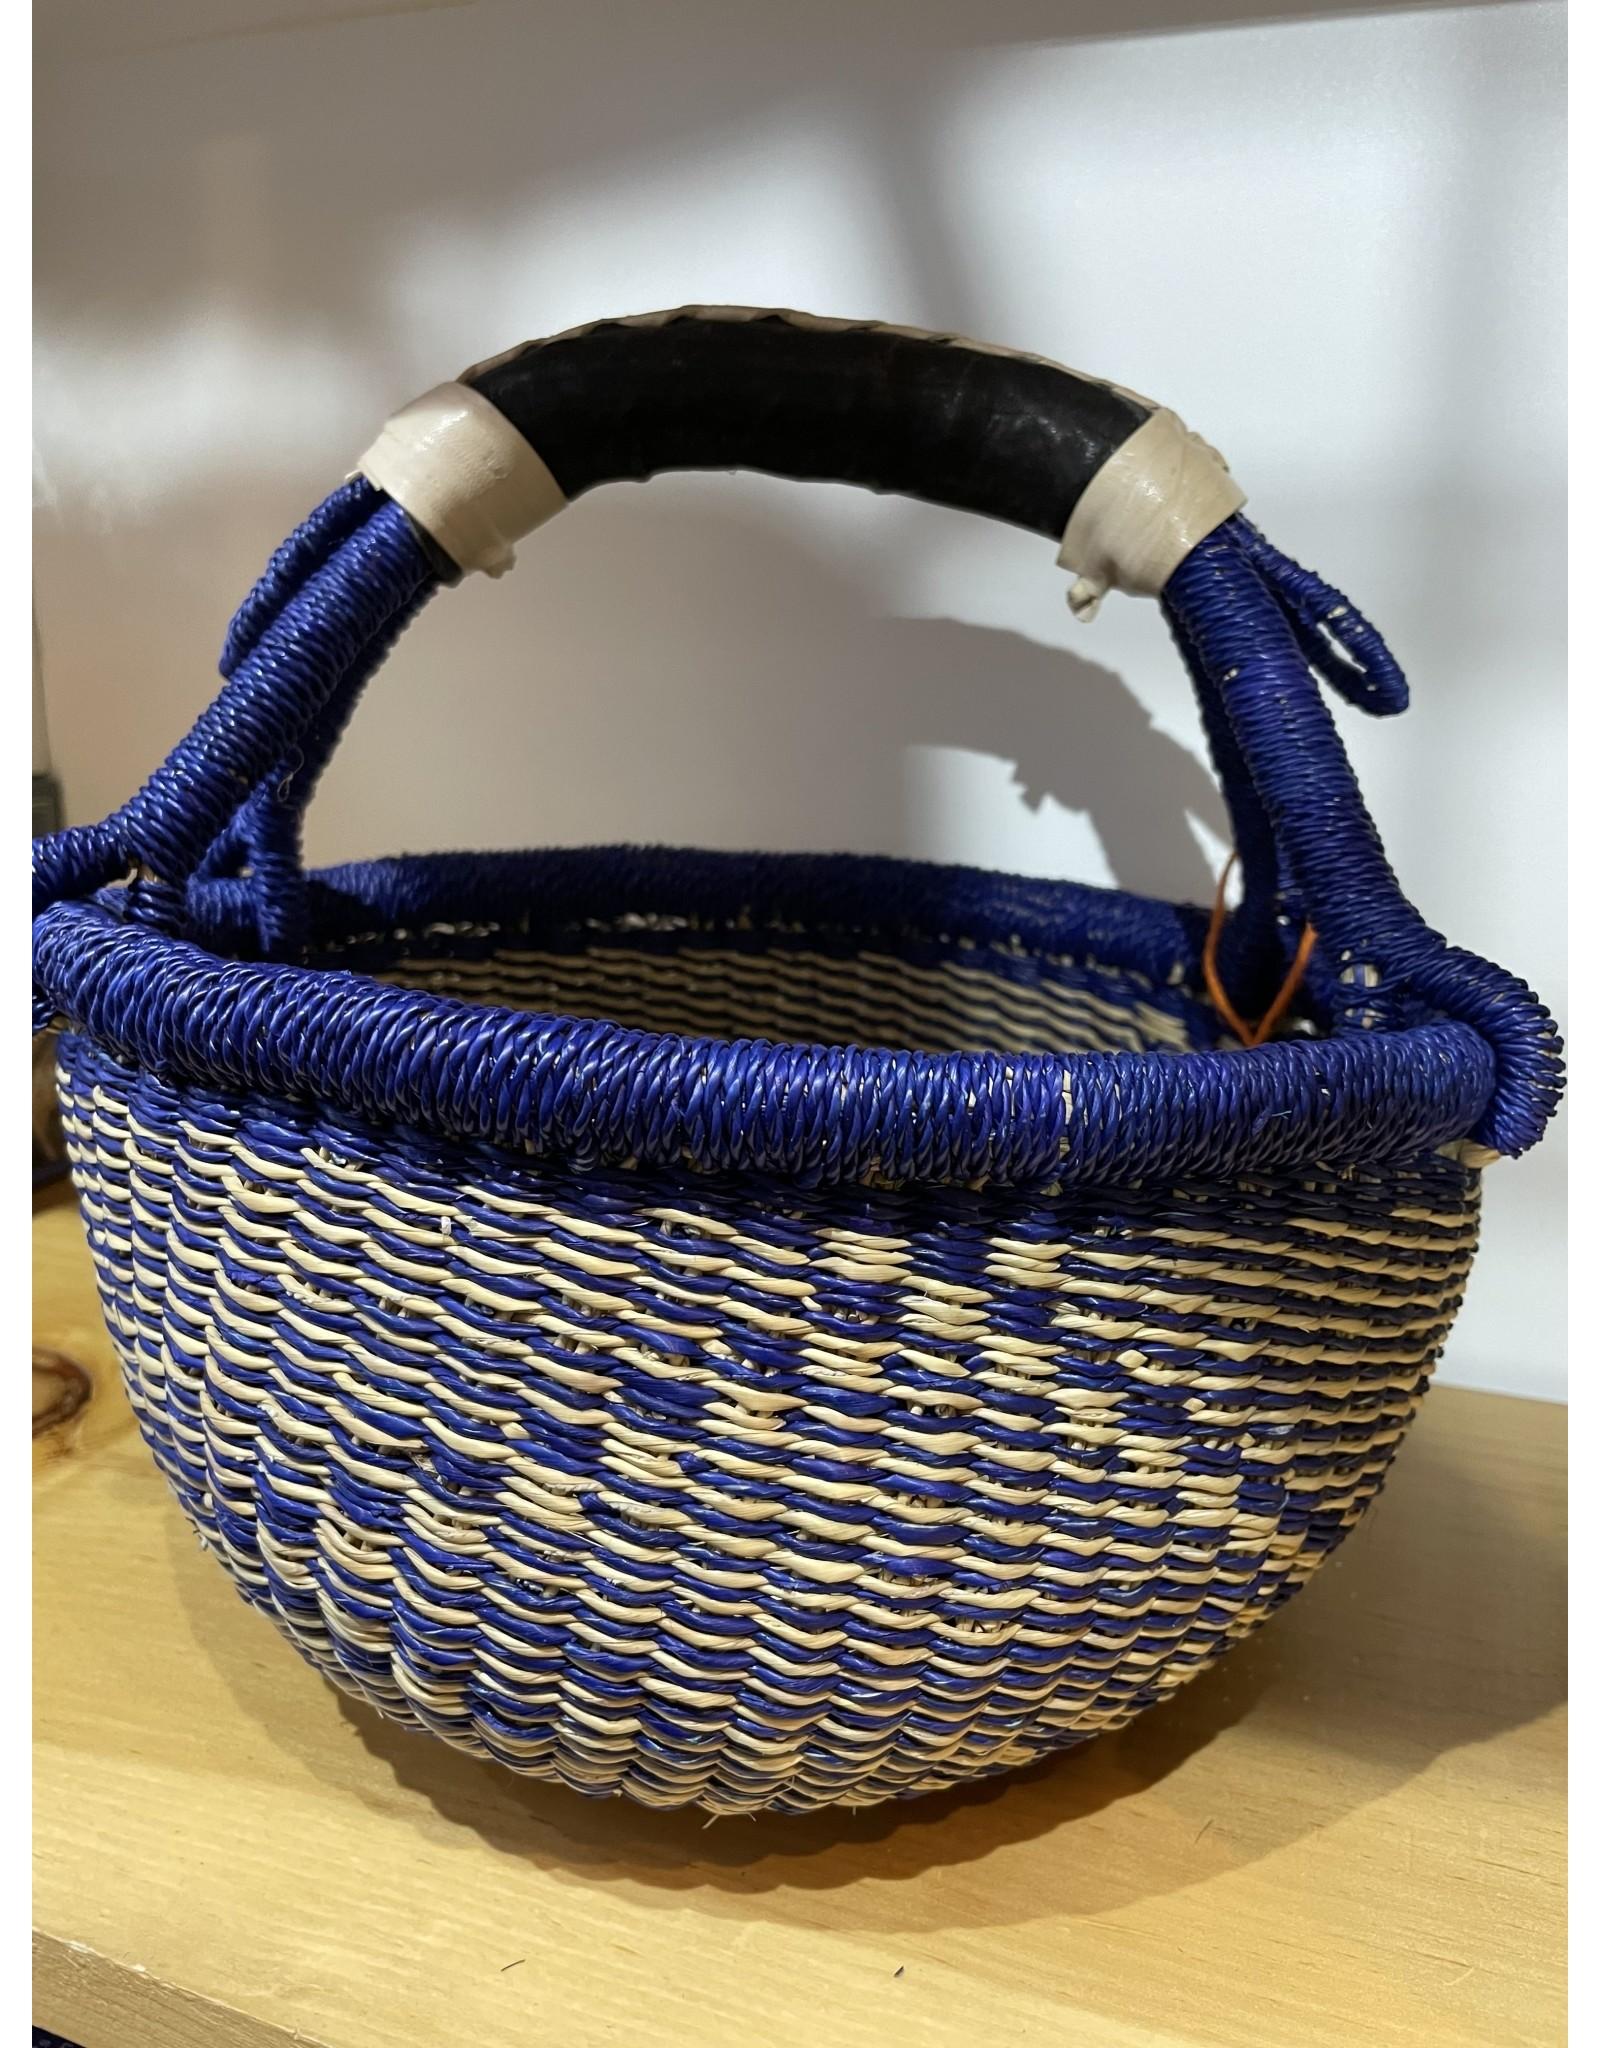 Big Blue Moma Colourful Bolga Basket Small B/N